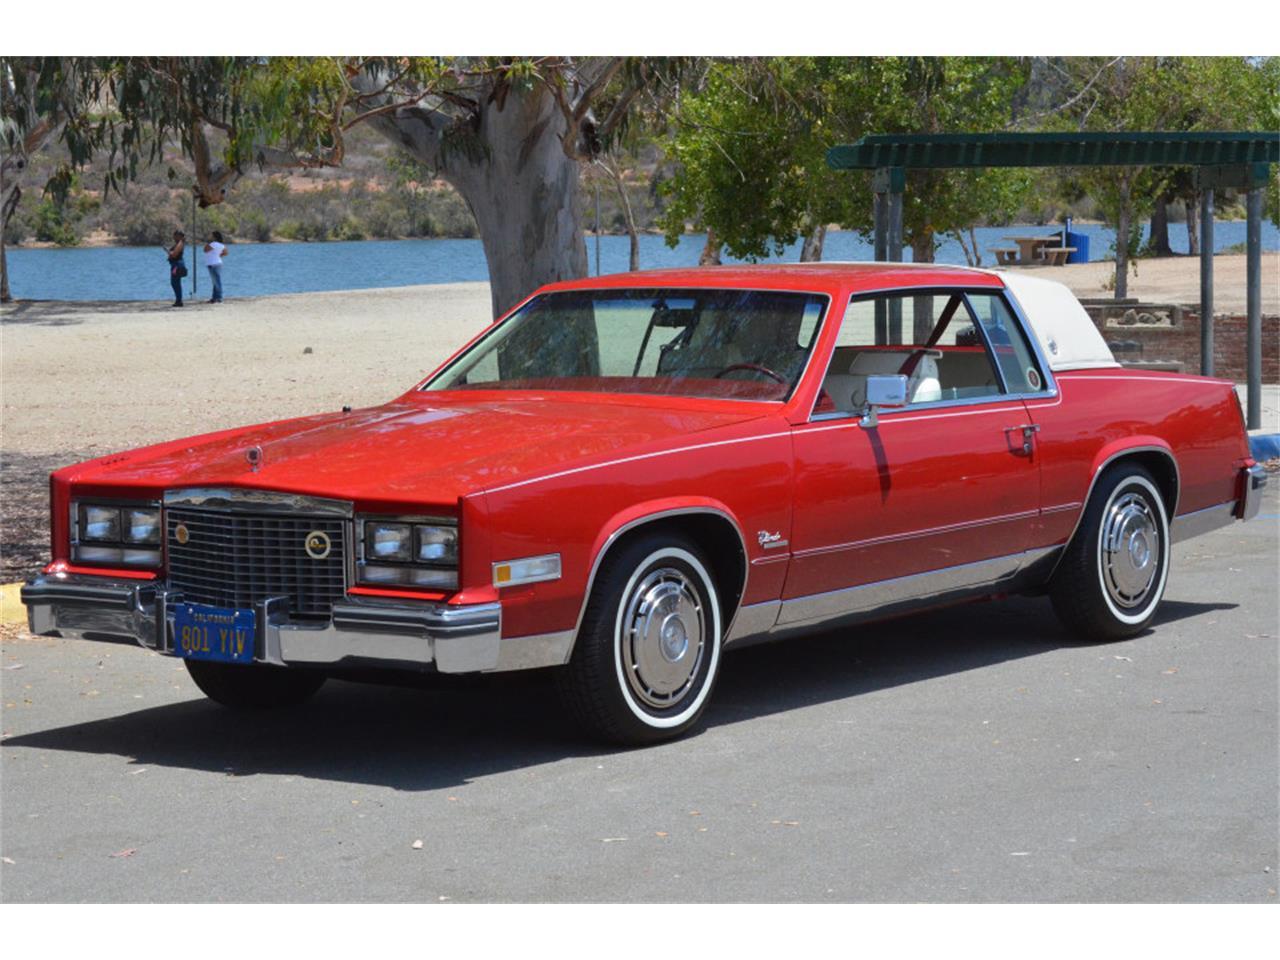 1979 Cadillac Eldorado (CC-1413814) for sale in SAN DIEGO, California